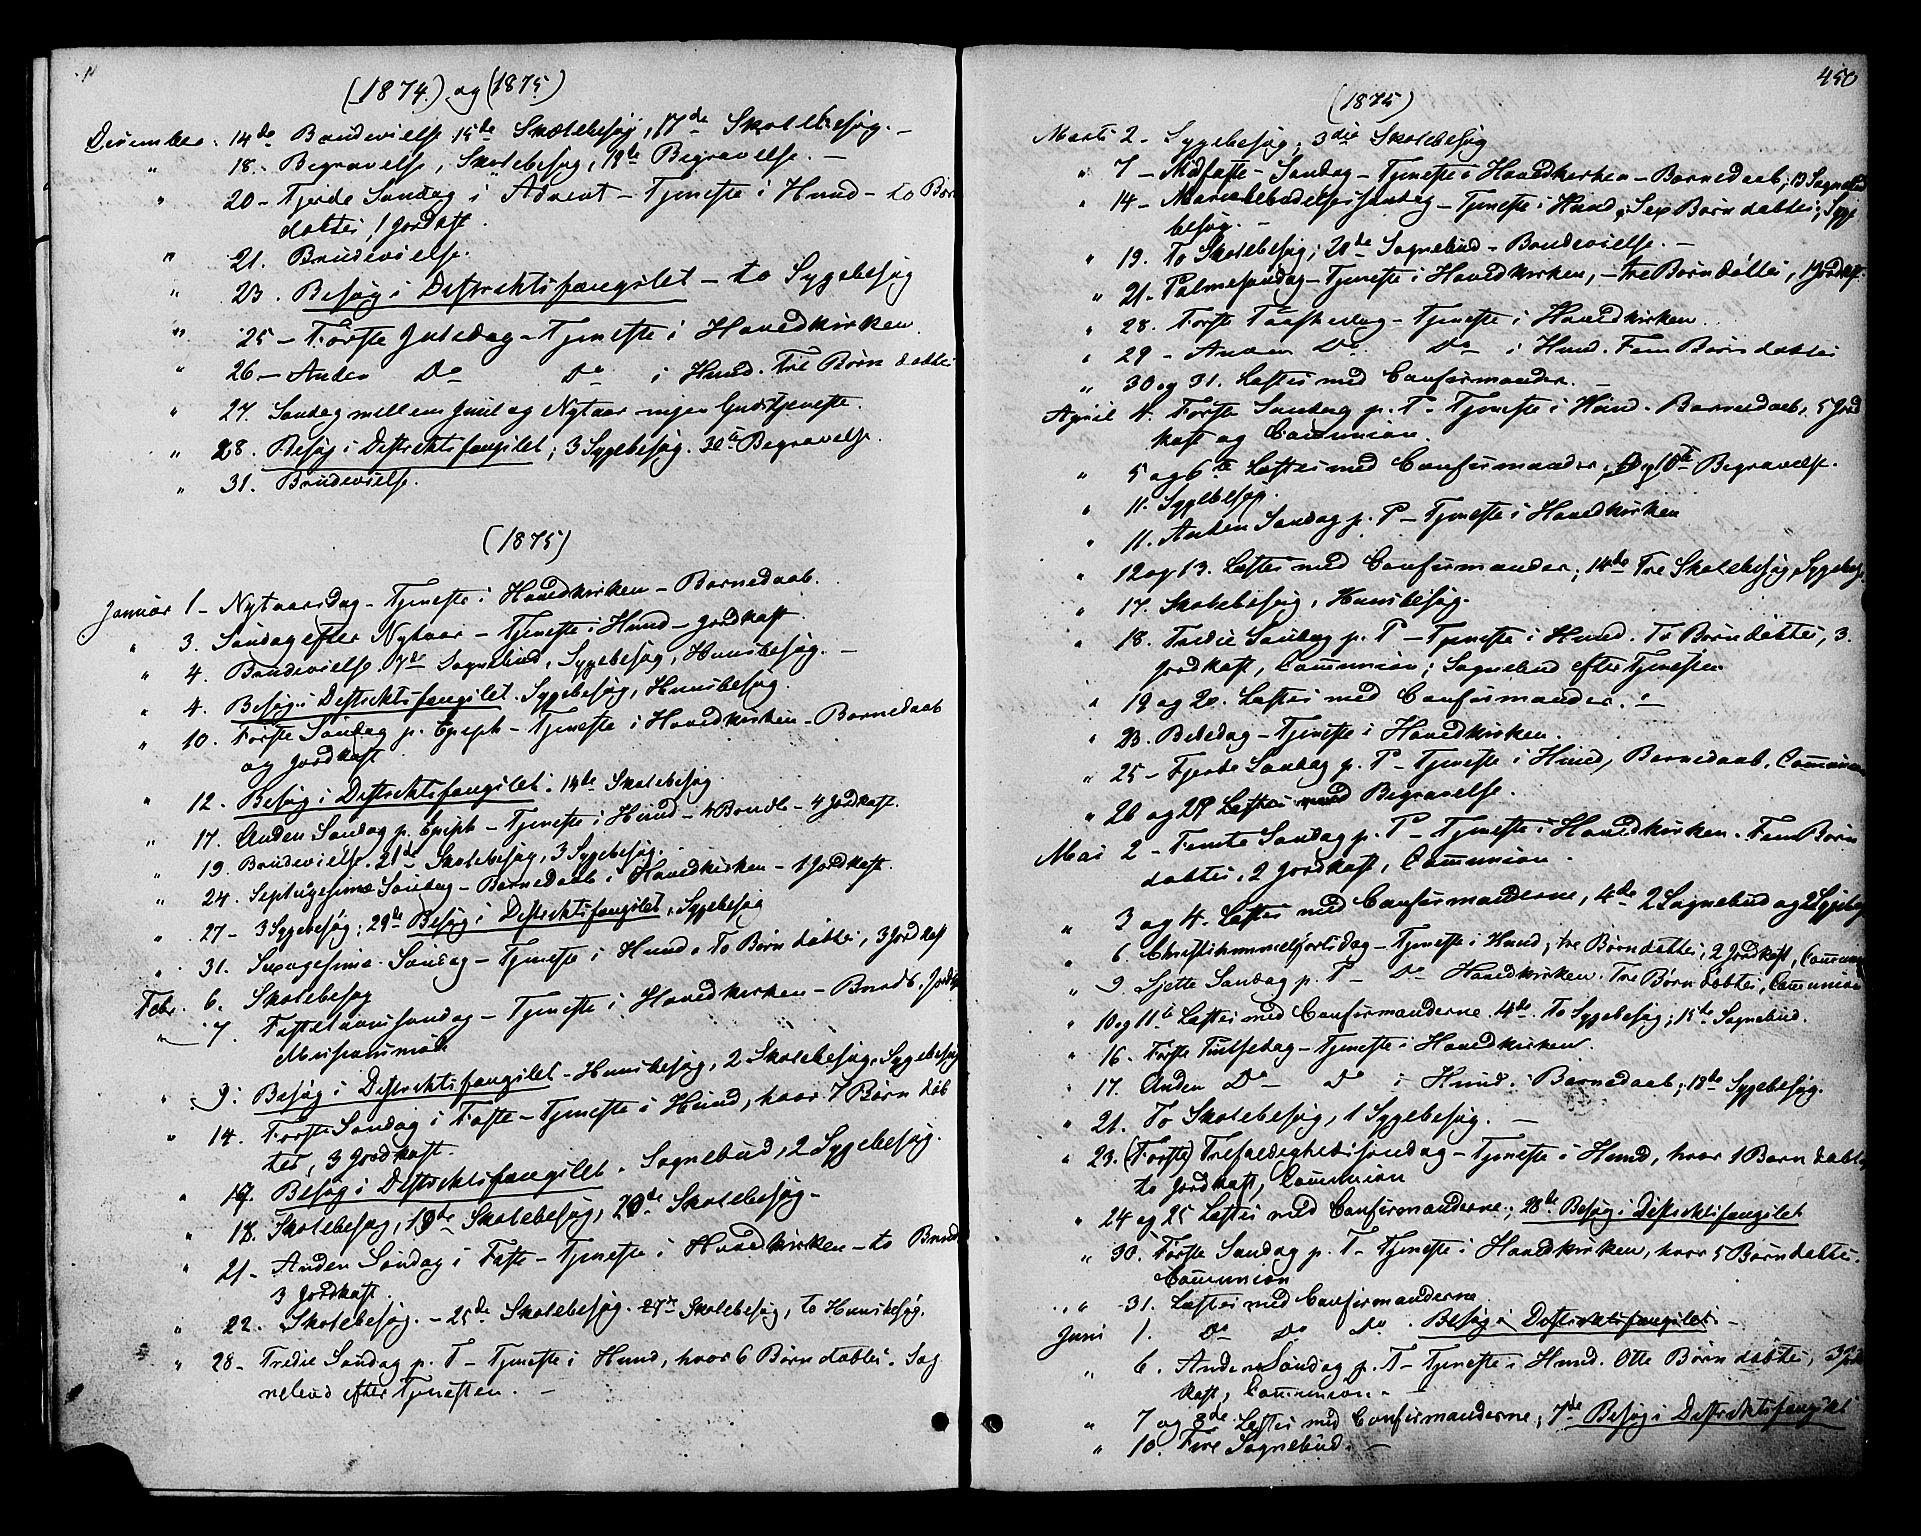 SAH, Vardal prestekontor, H/Ha/Haa/L0007: Ministerialbok nr. 7, 1867-1878, s. 450